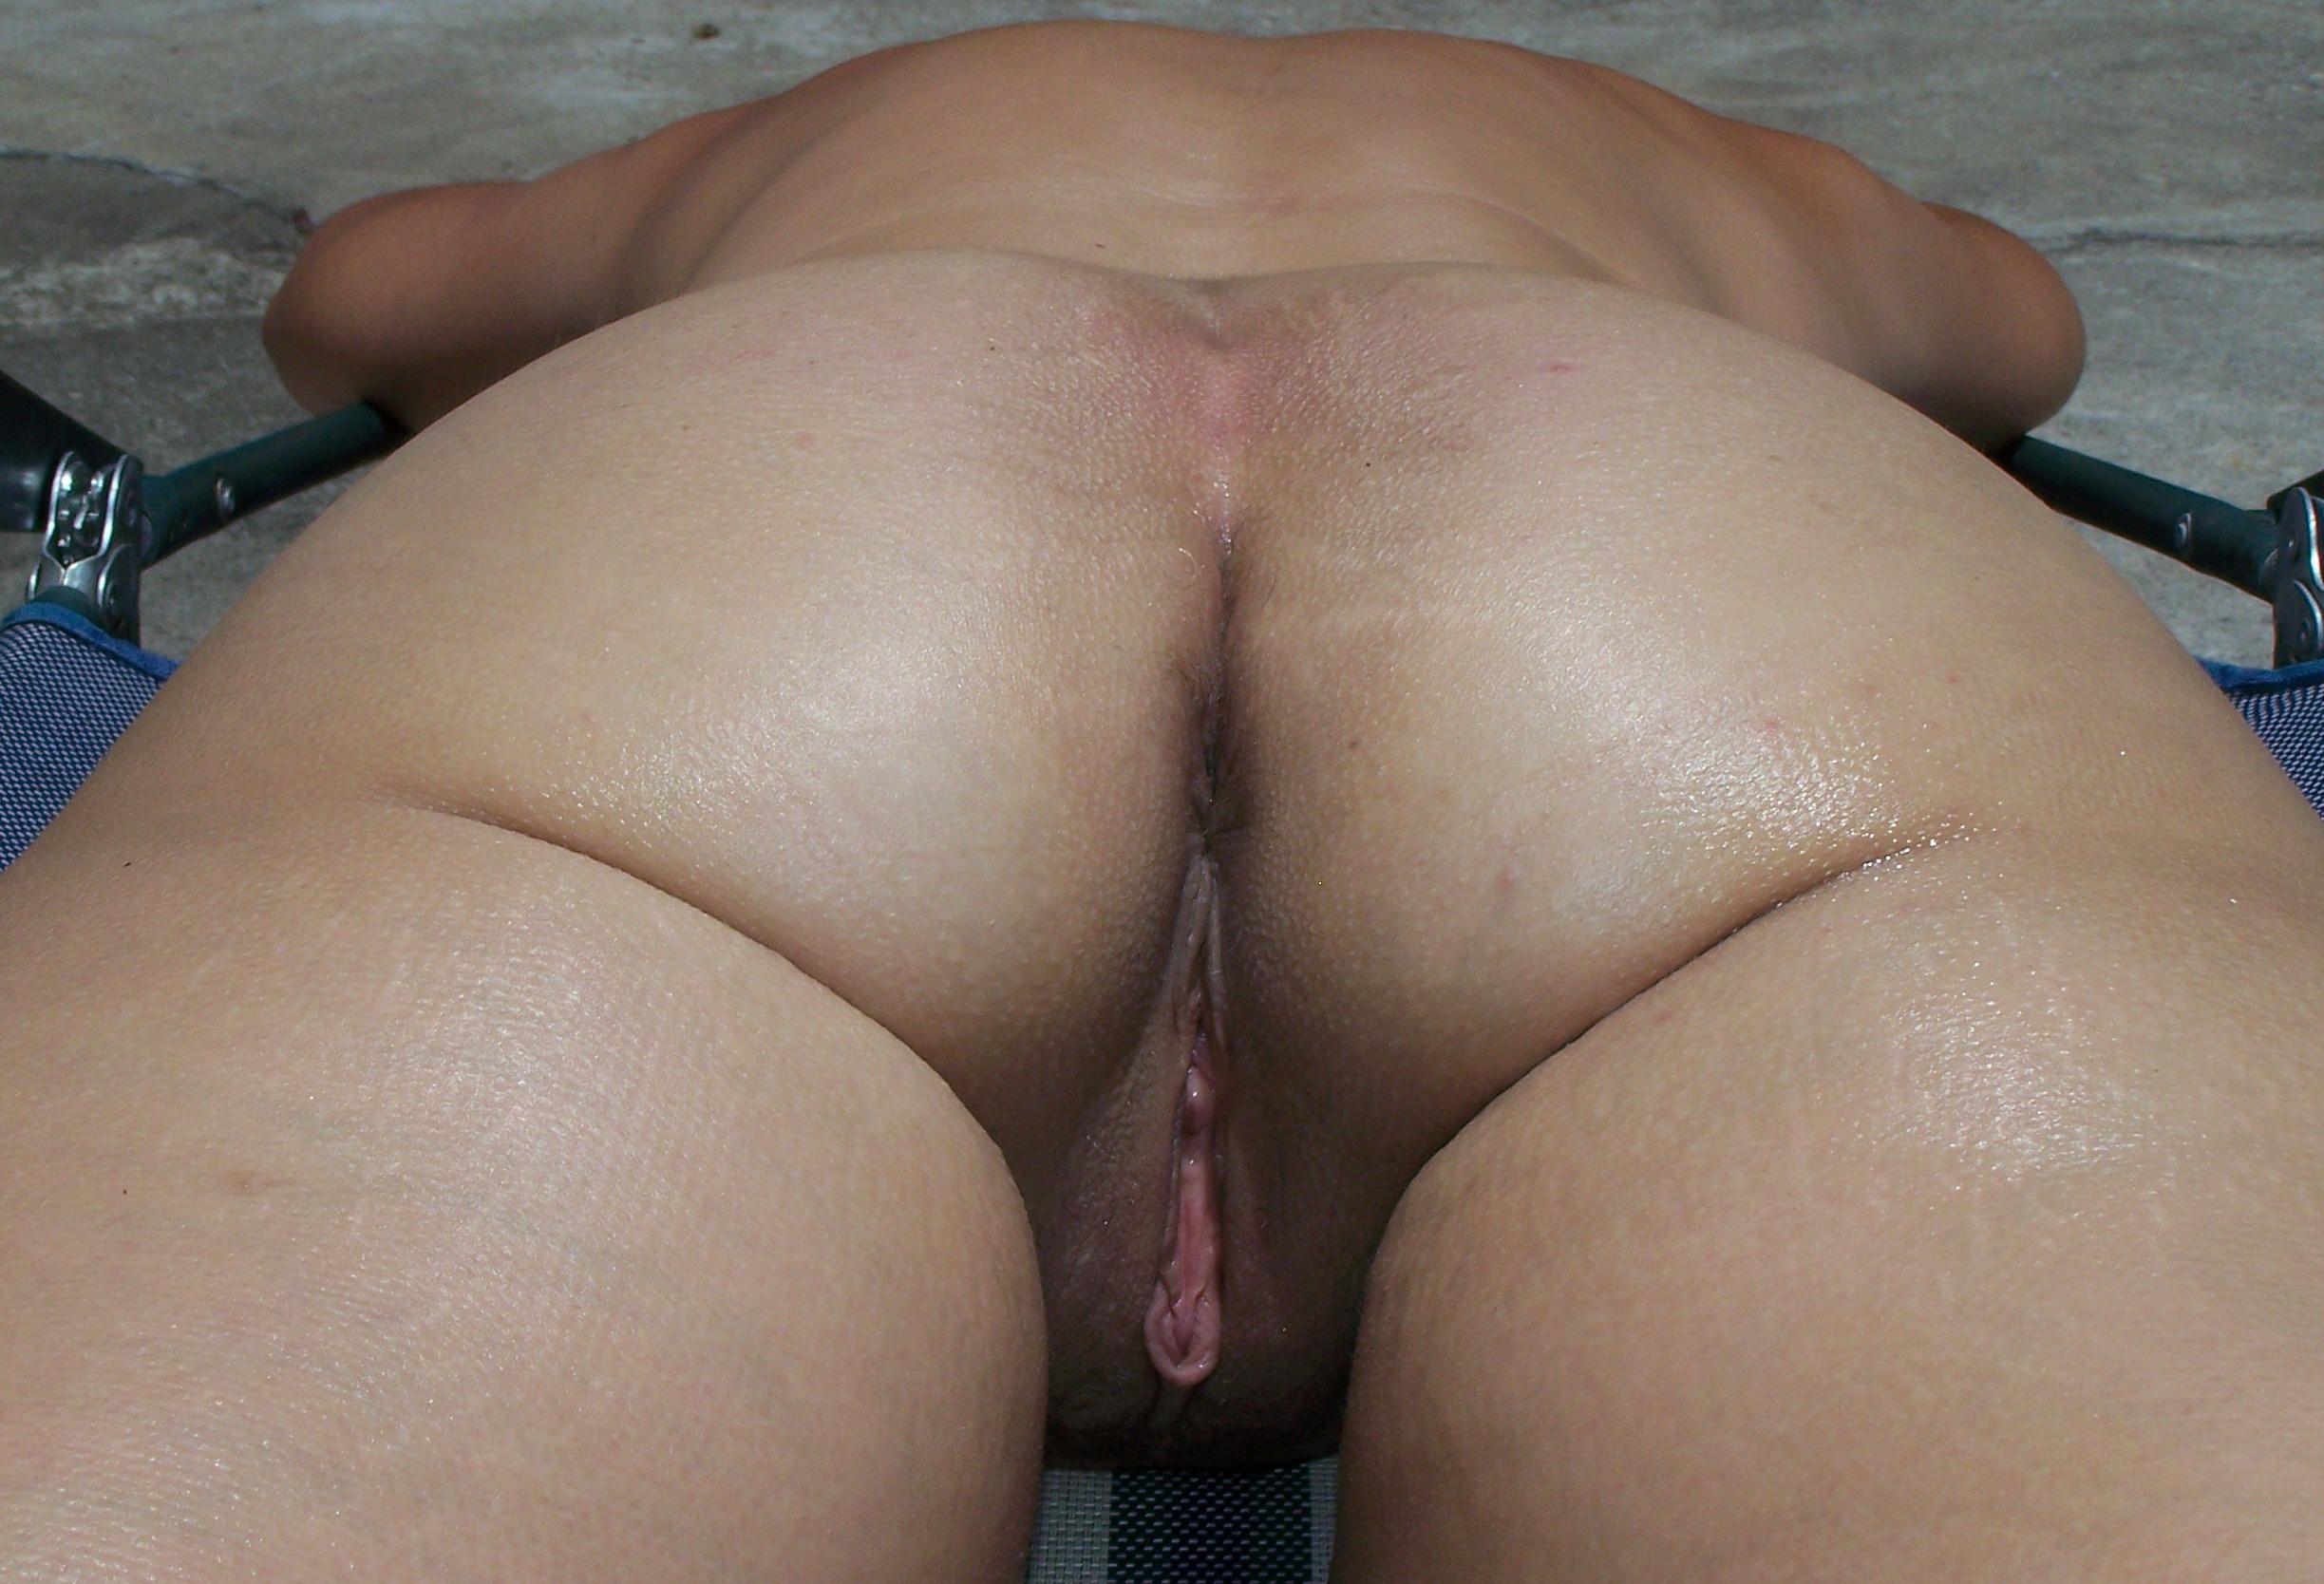 laura perego free porn pictures